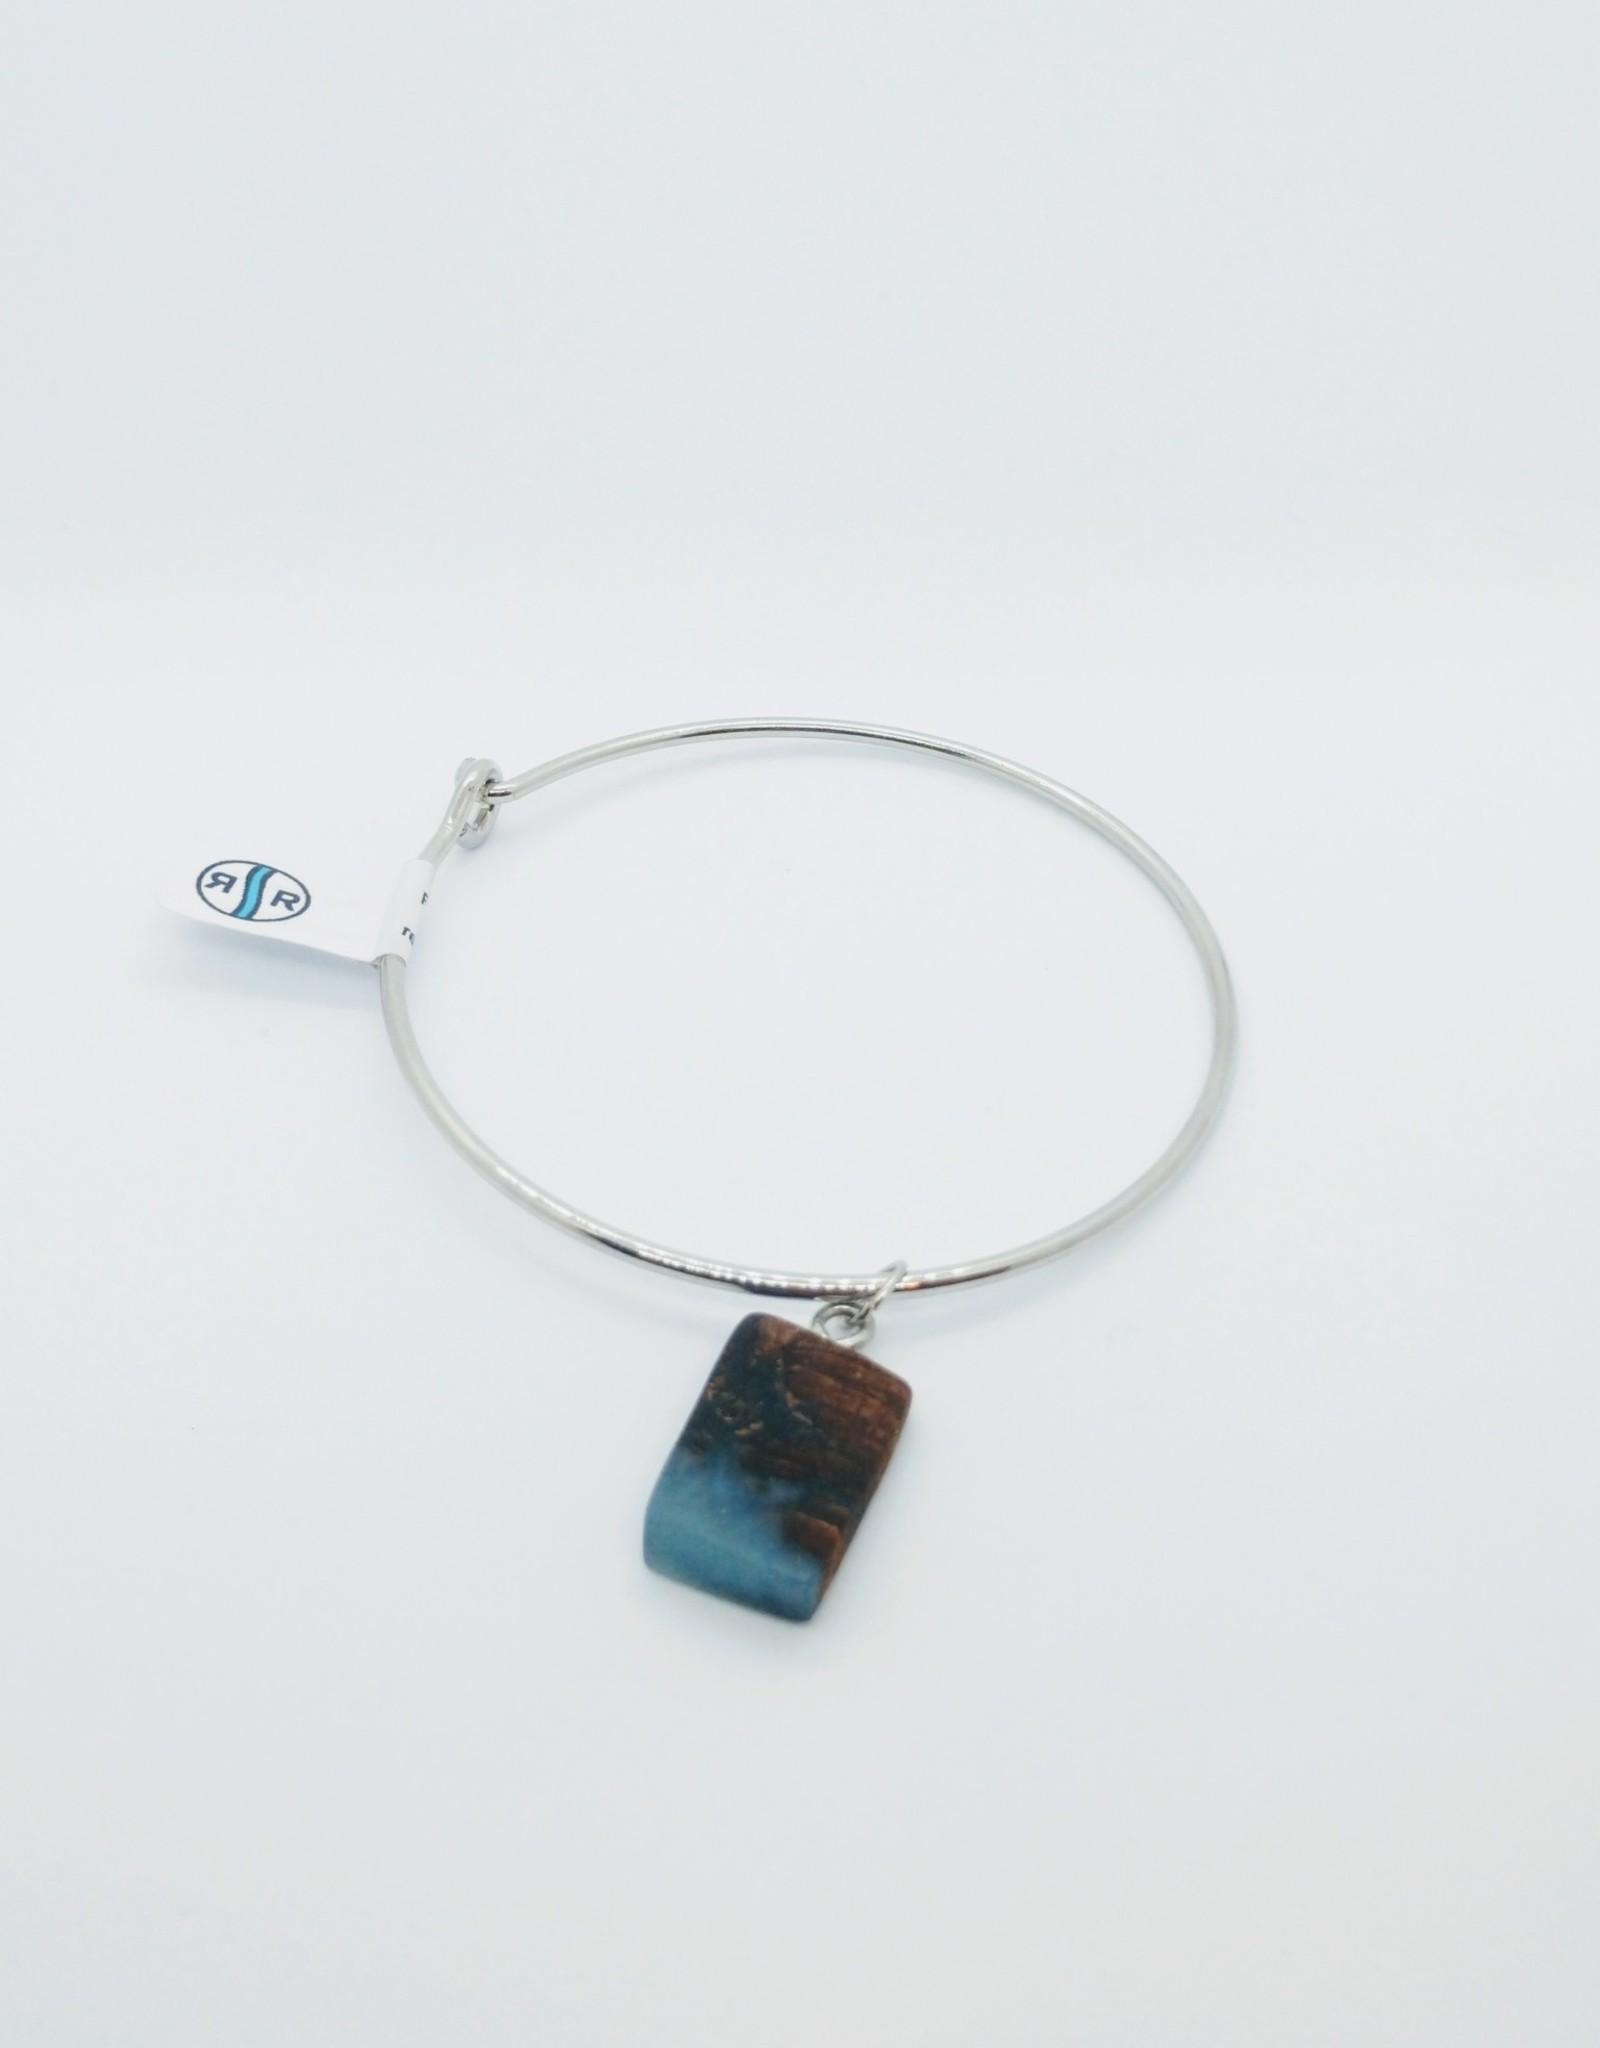 Resin River Designs Resin River Designs - Bracelet #1